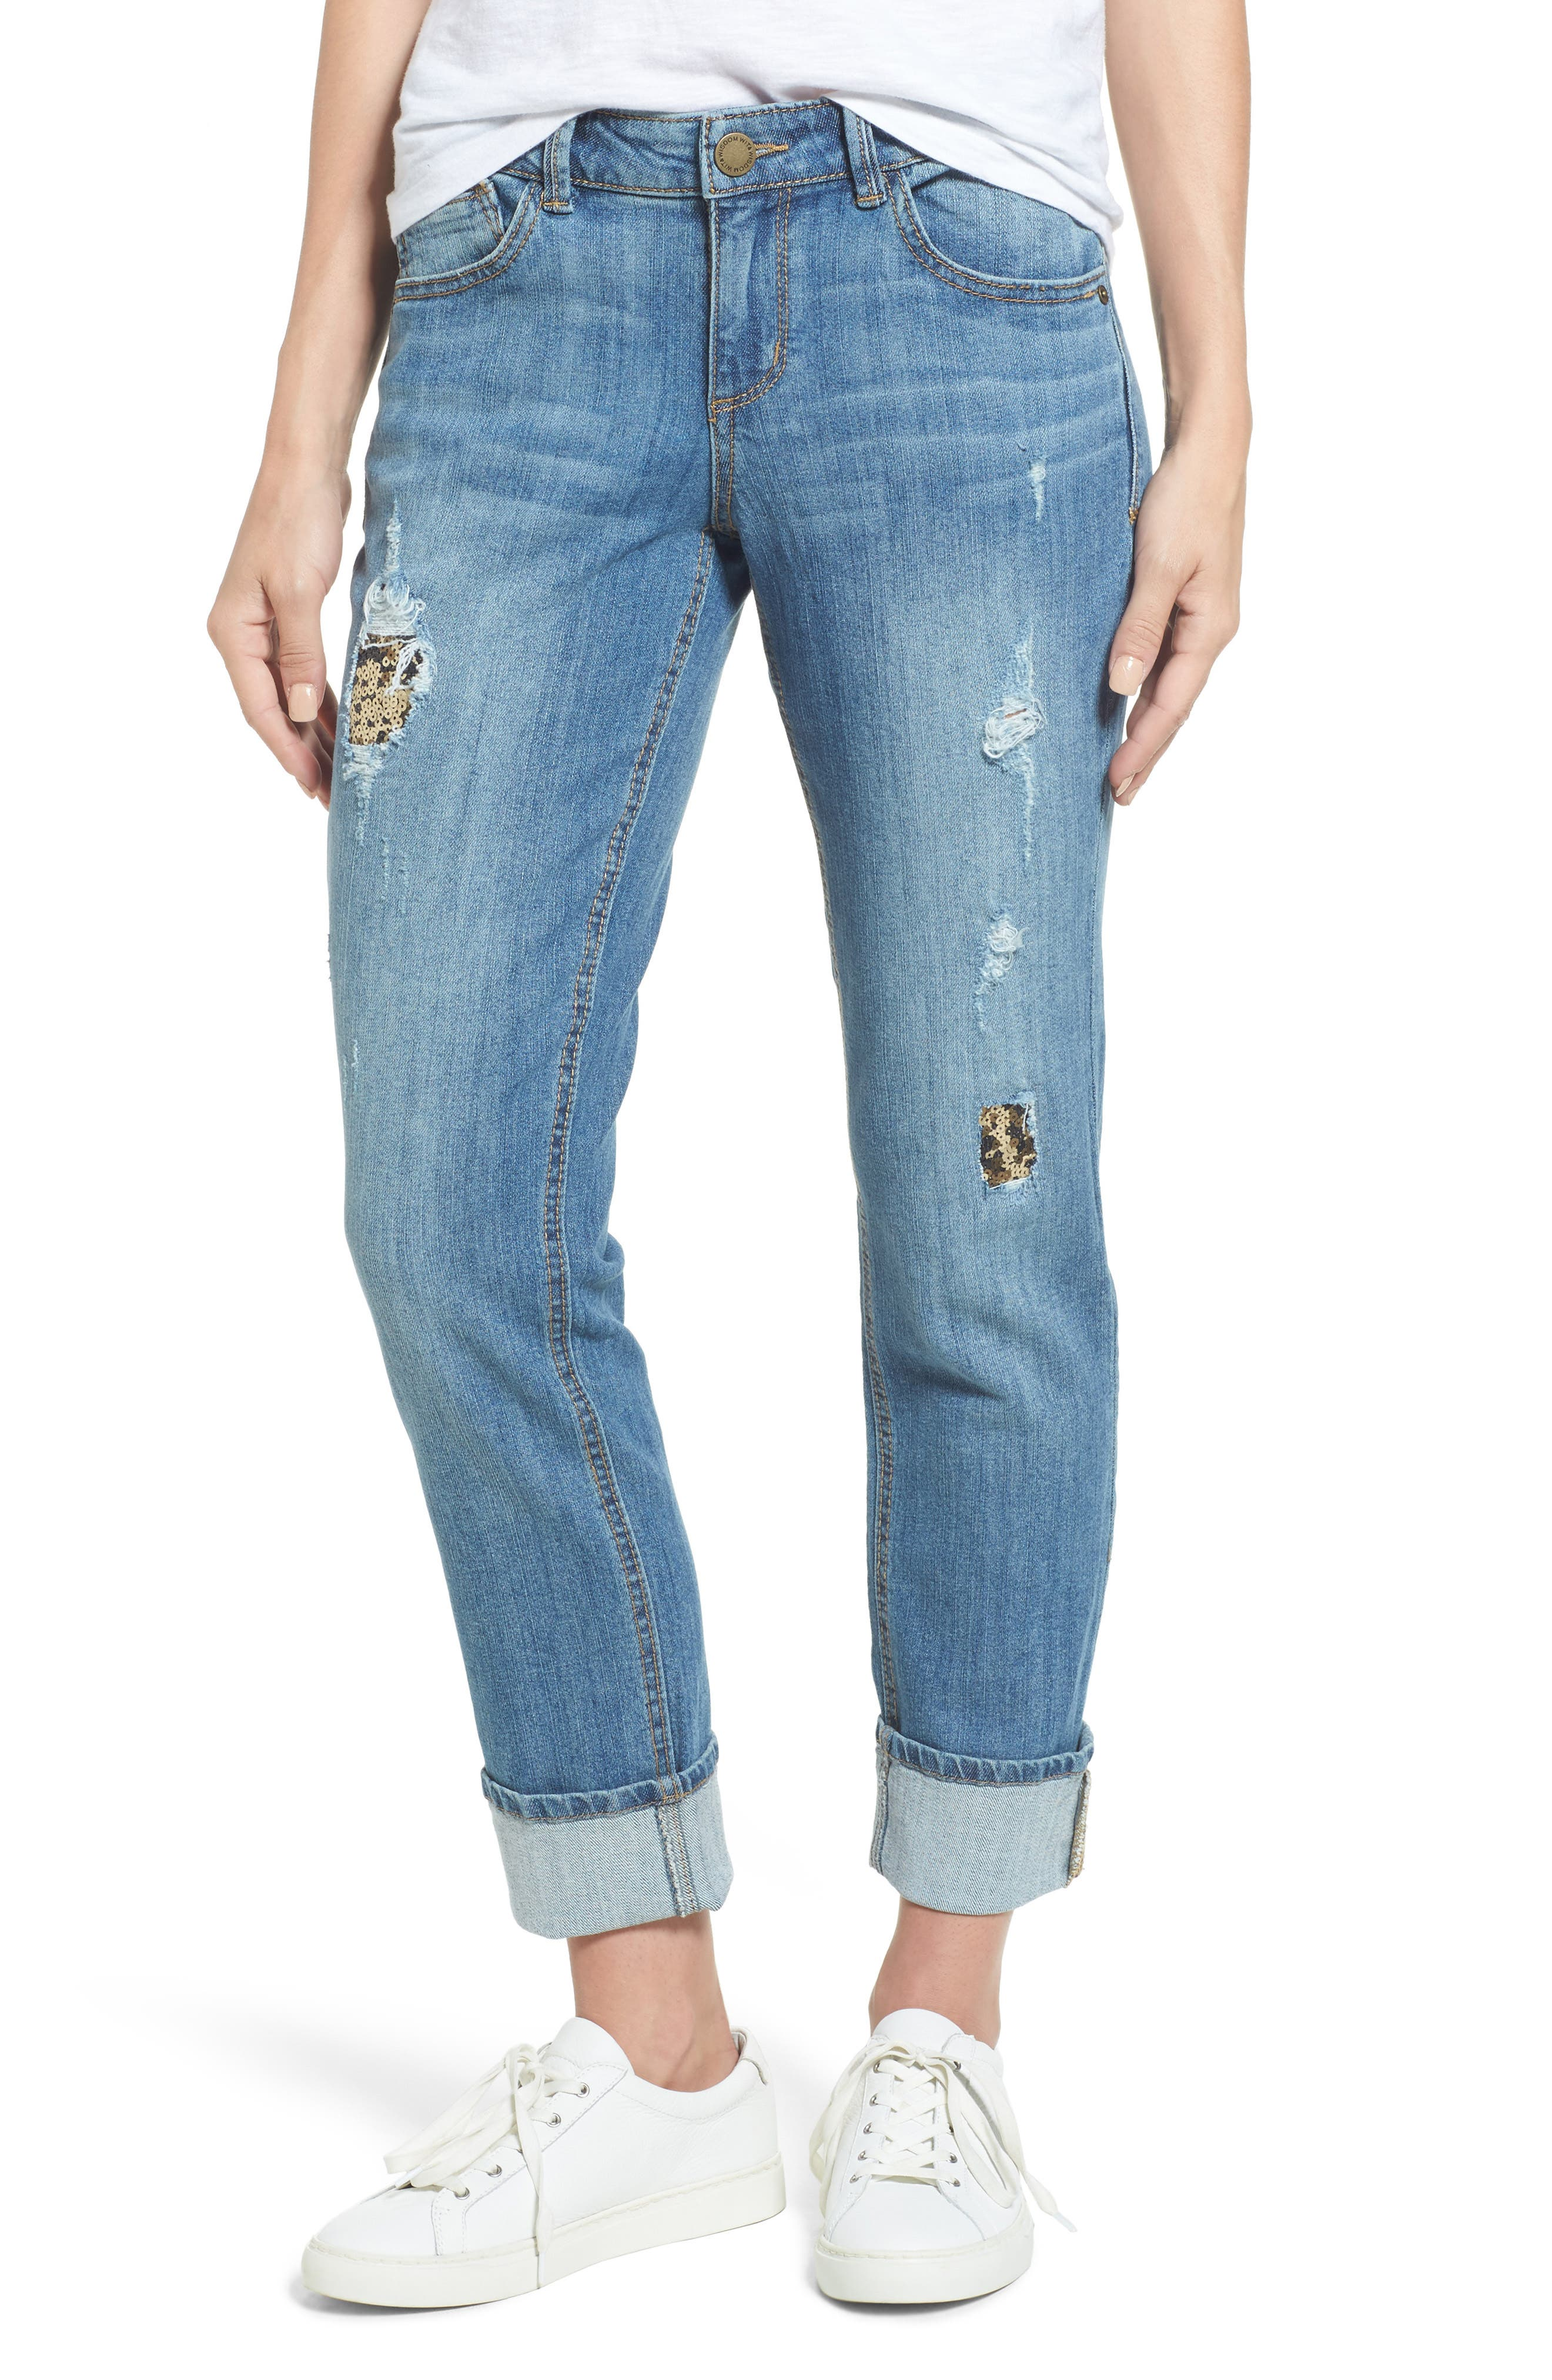 Main Image - Wit & Wisdom Flexellent Skinny Girlfriend Jeans (Nordstrom Exclusive)